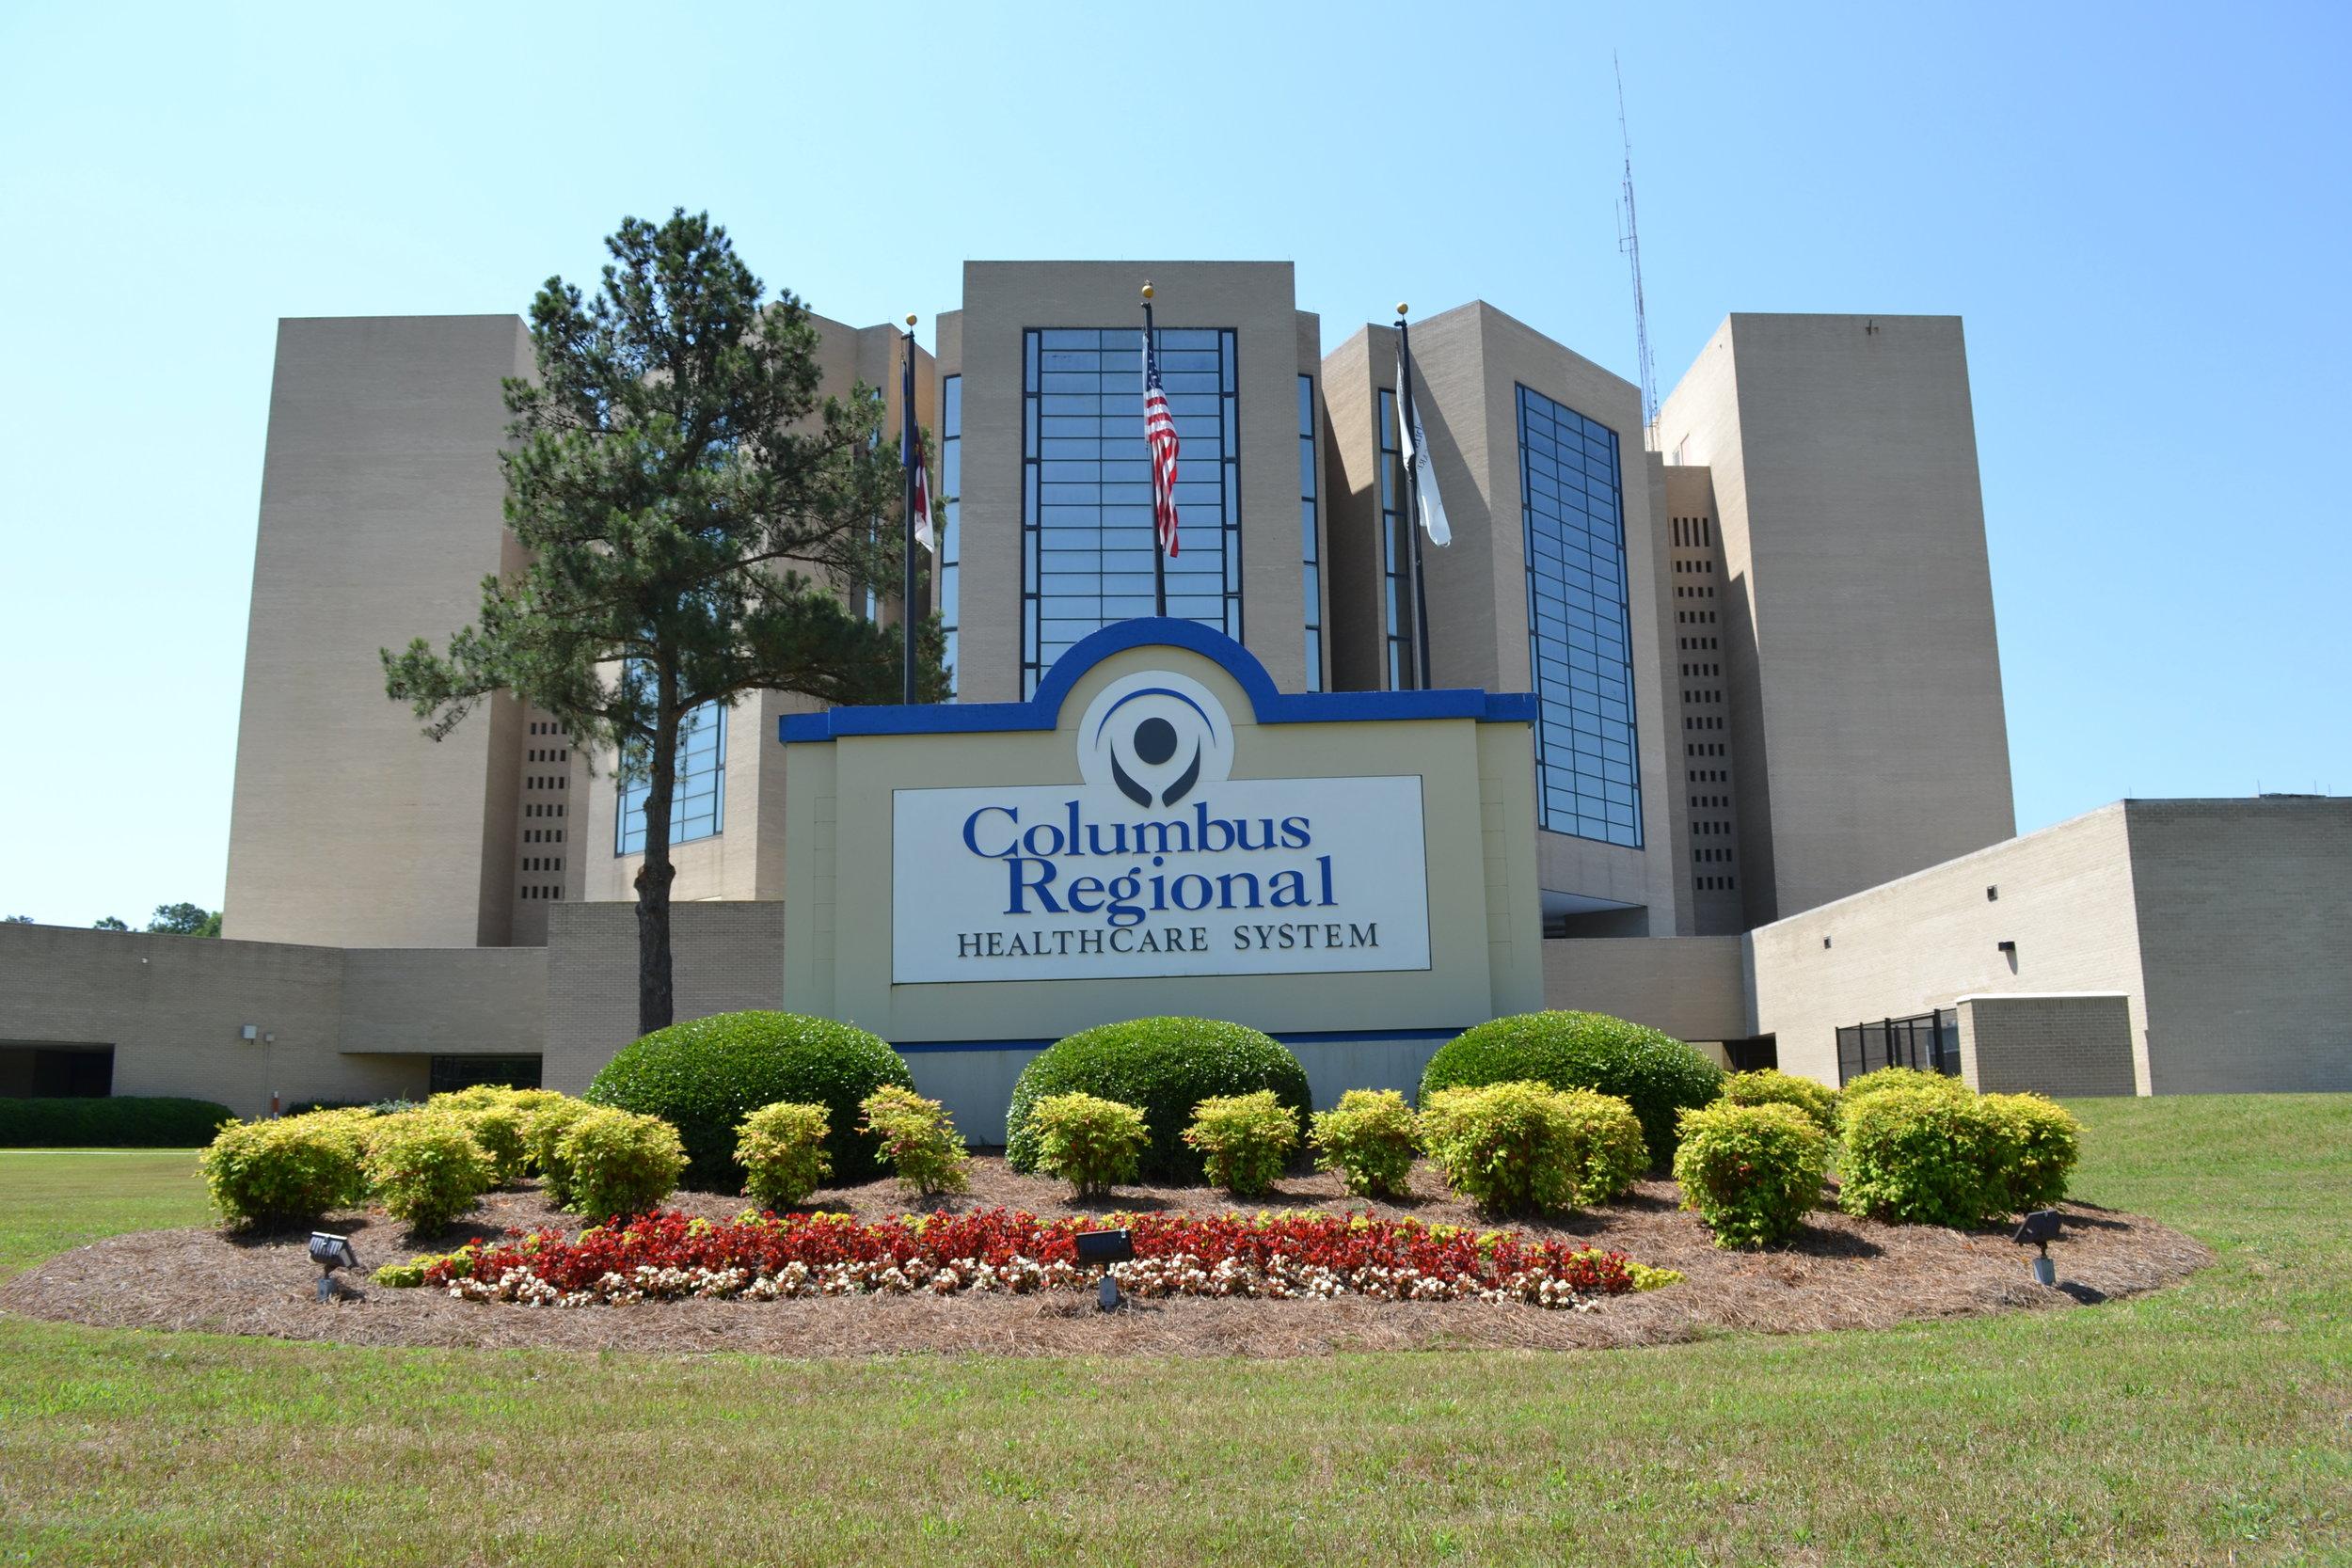 Columbus Regional Hospital copy.JPG